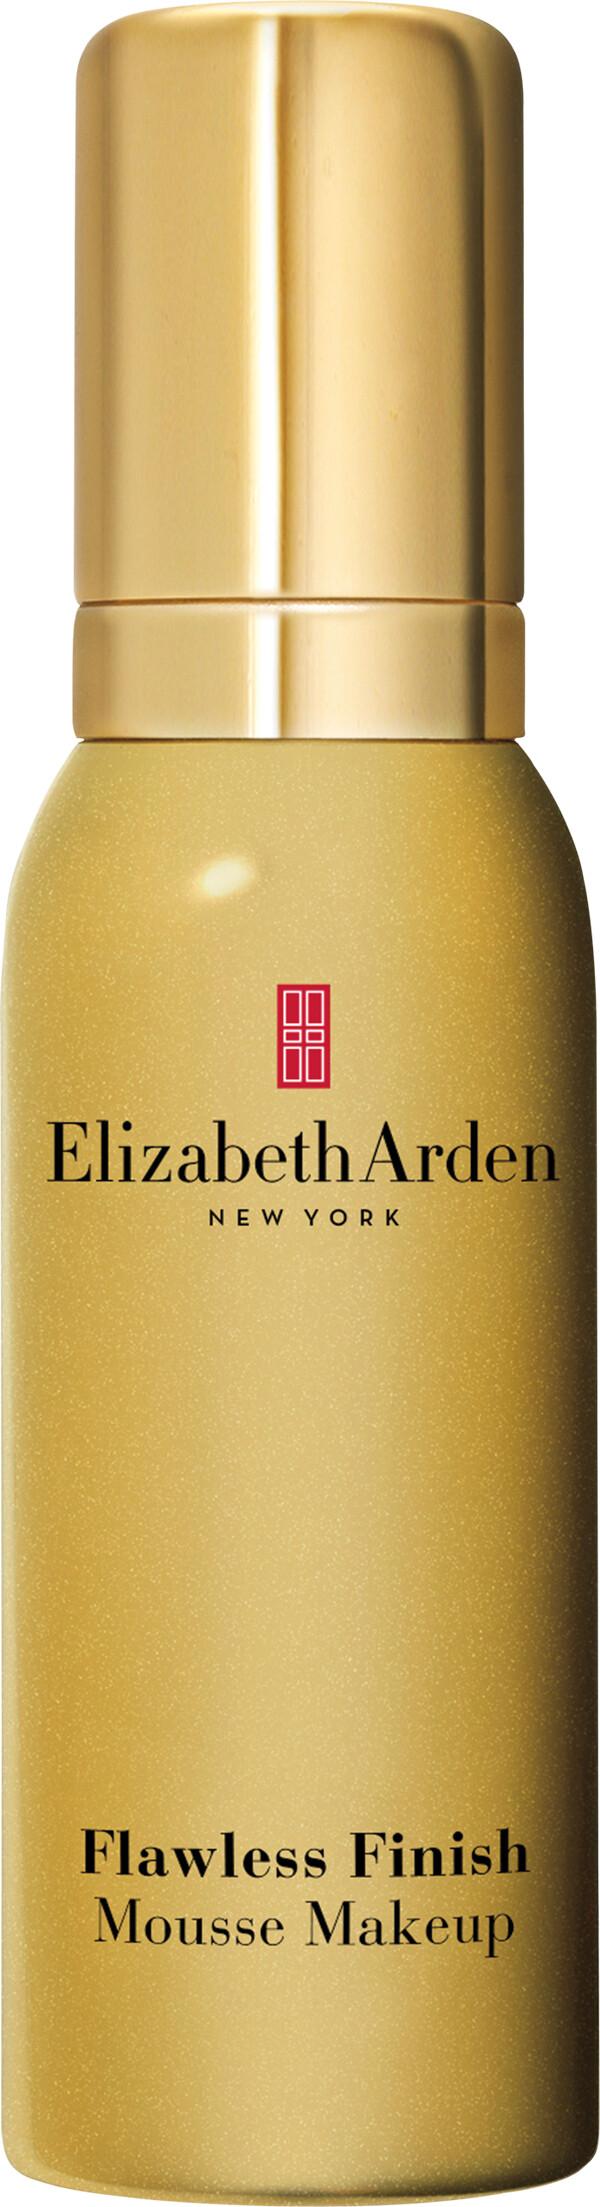 Elizabeth Arden Flawless Finish Mousse Makeup 50ml 01  Sparkling Blush